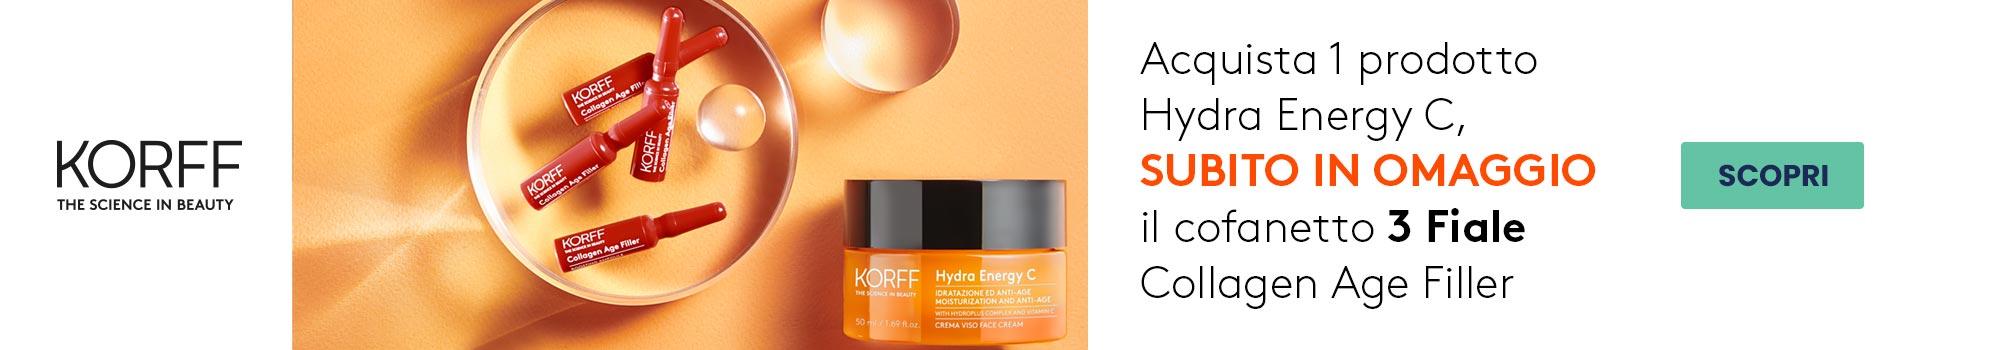 korff hydra energy c